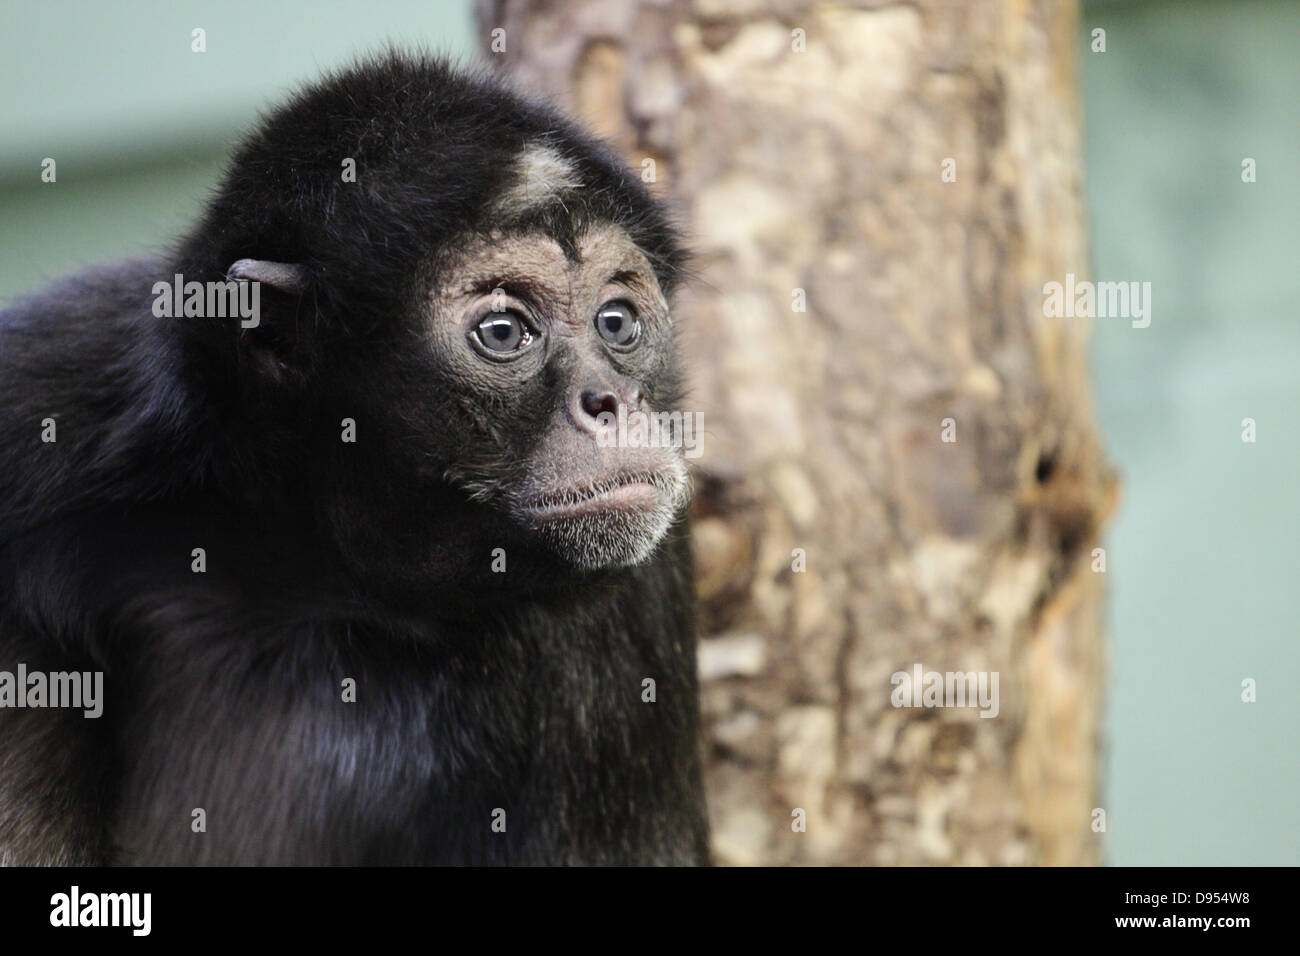 Monkey at Bristol Zoo. - Stock Image